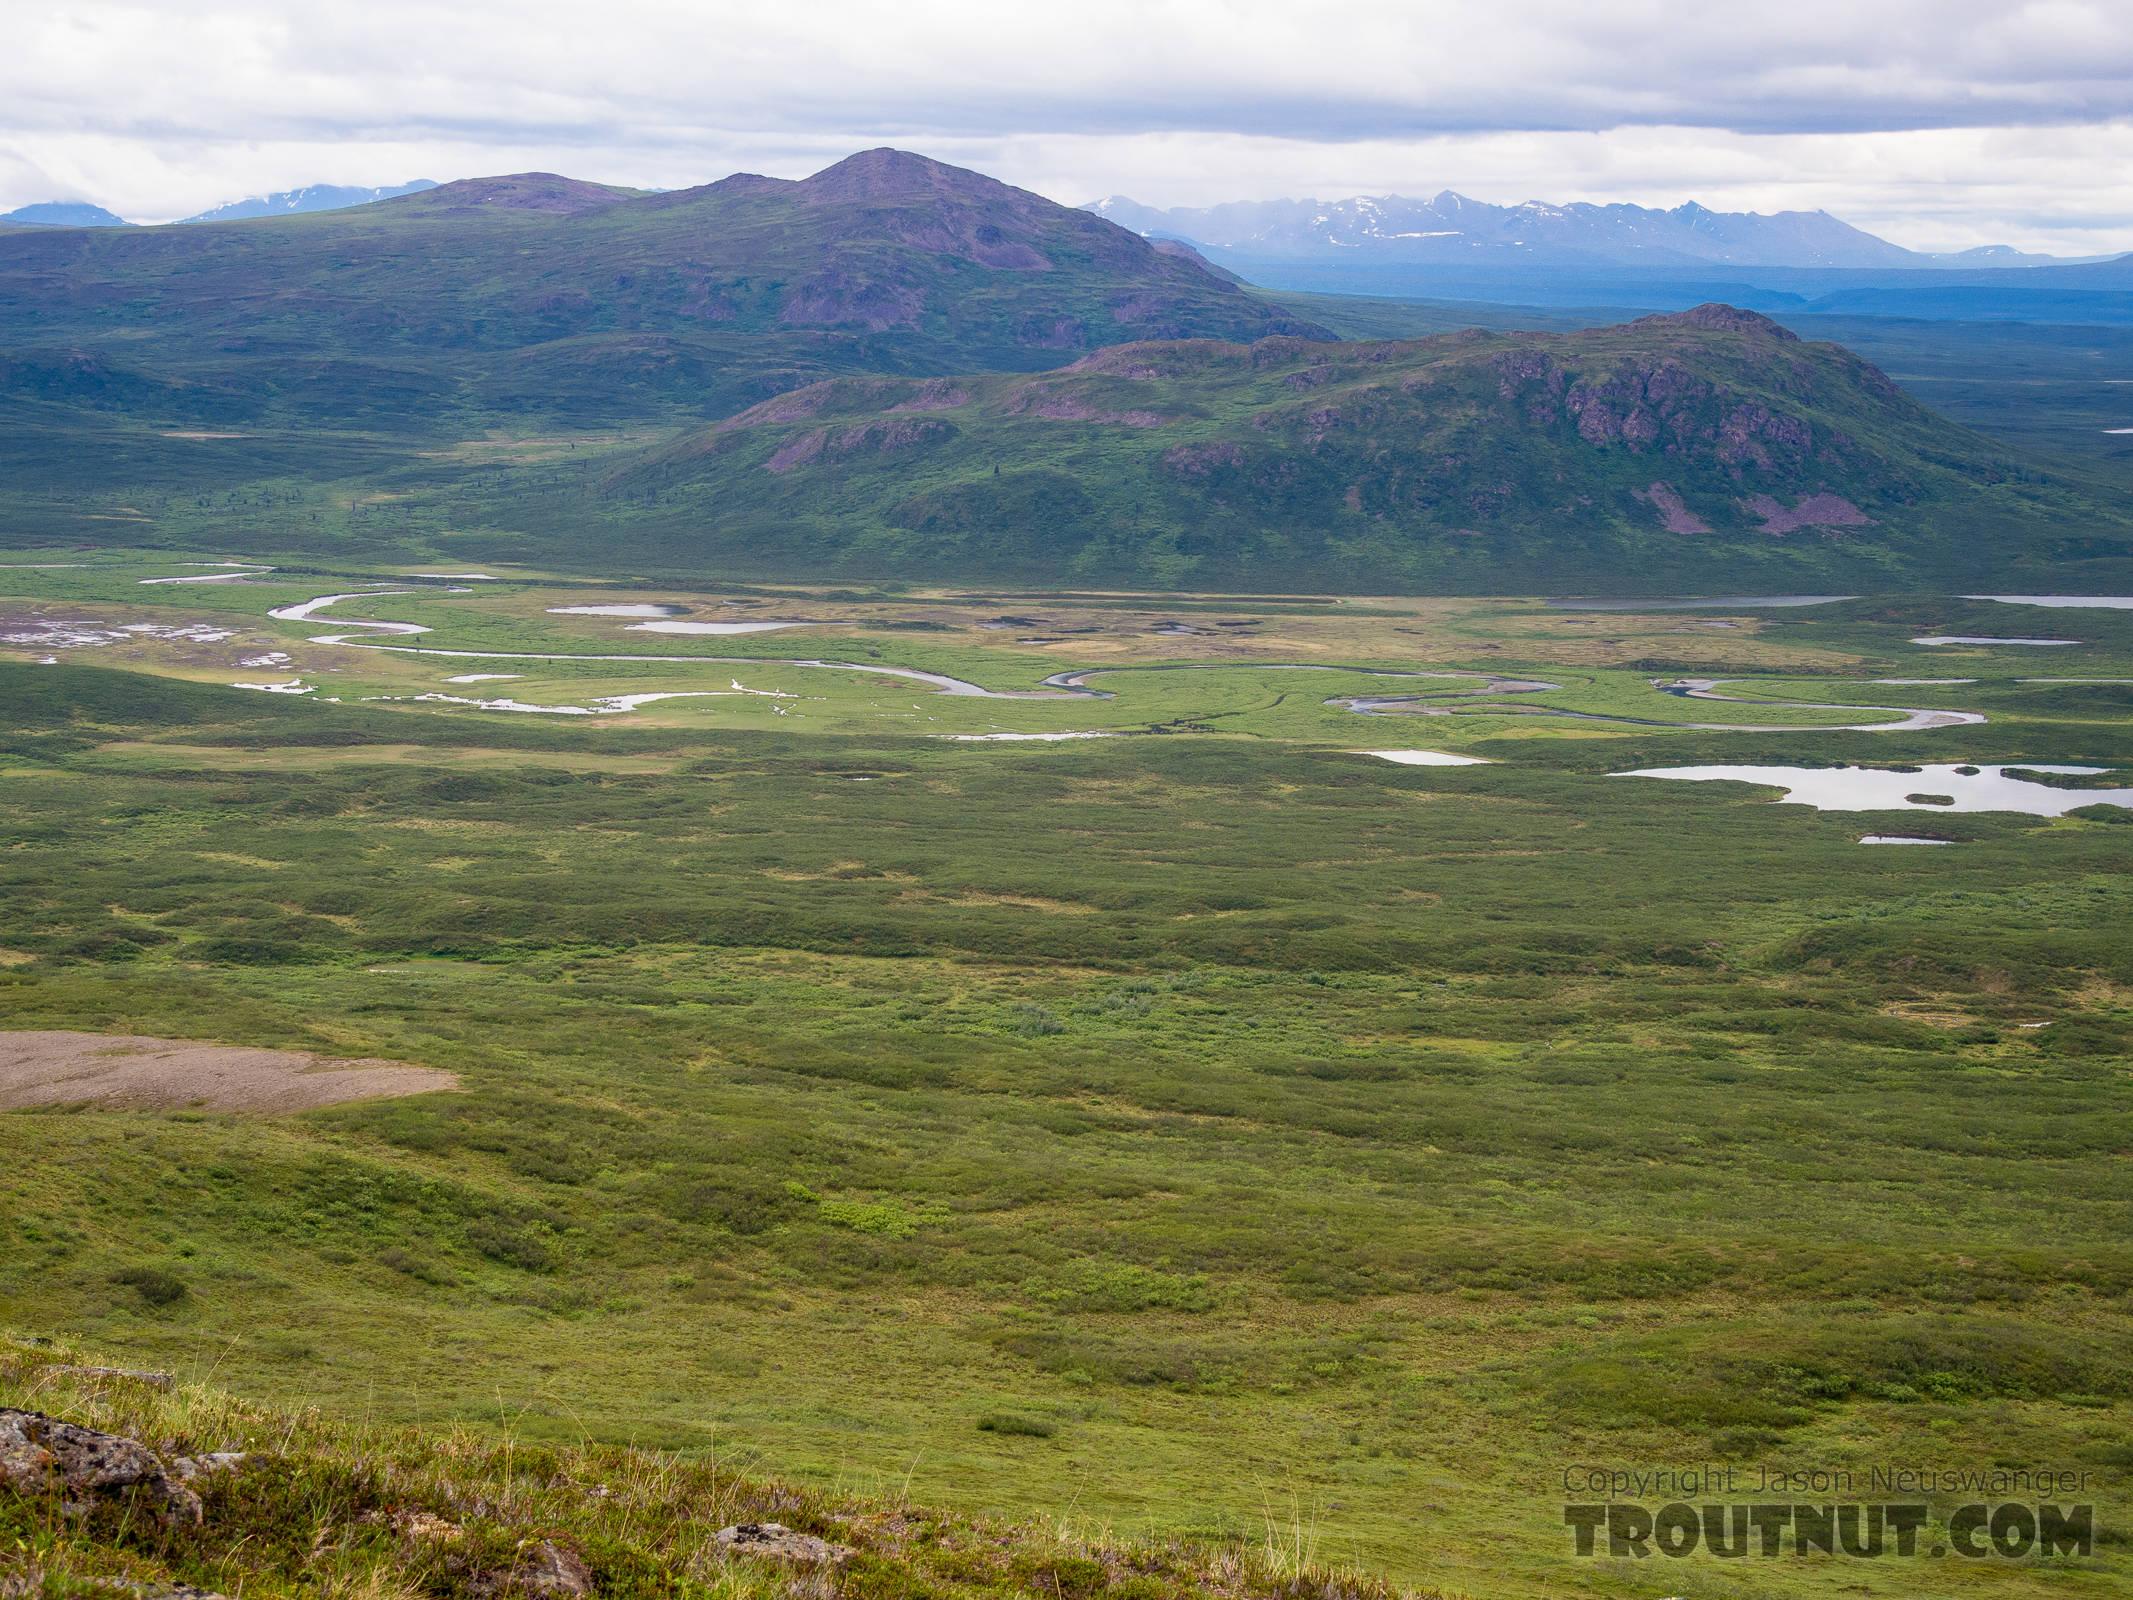 Clearwater Creek meanders in the distance. From Clearwater Creek in Alaska.